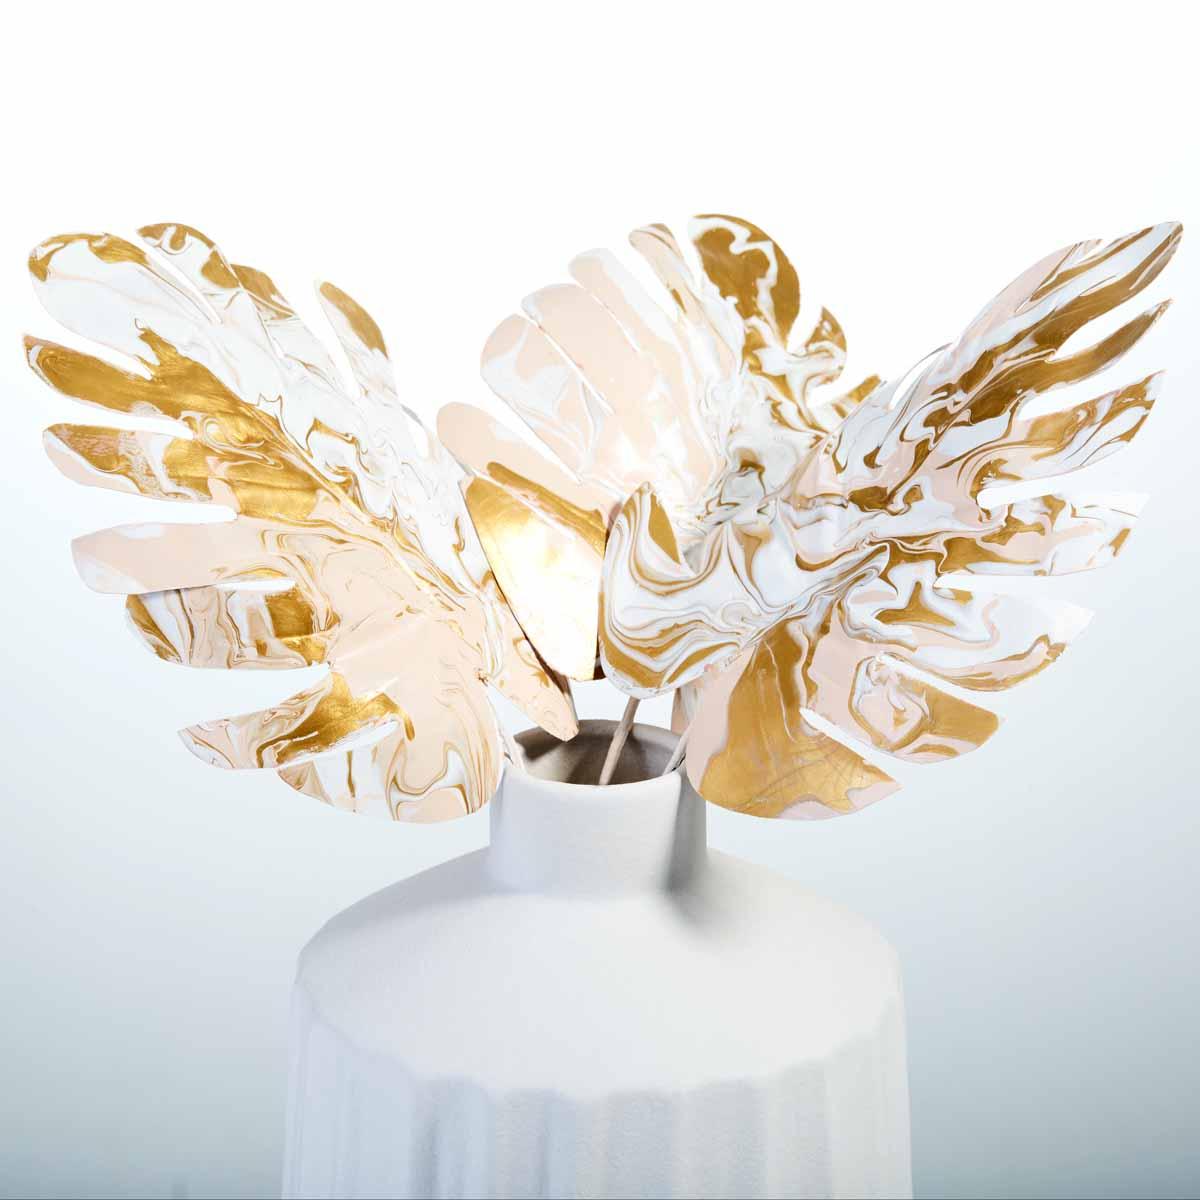 Marbled Leaf Motif DIY Home Decor Accent